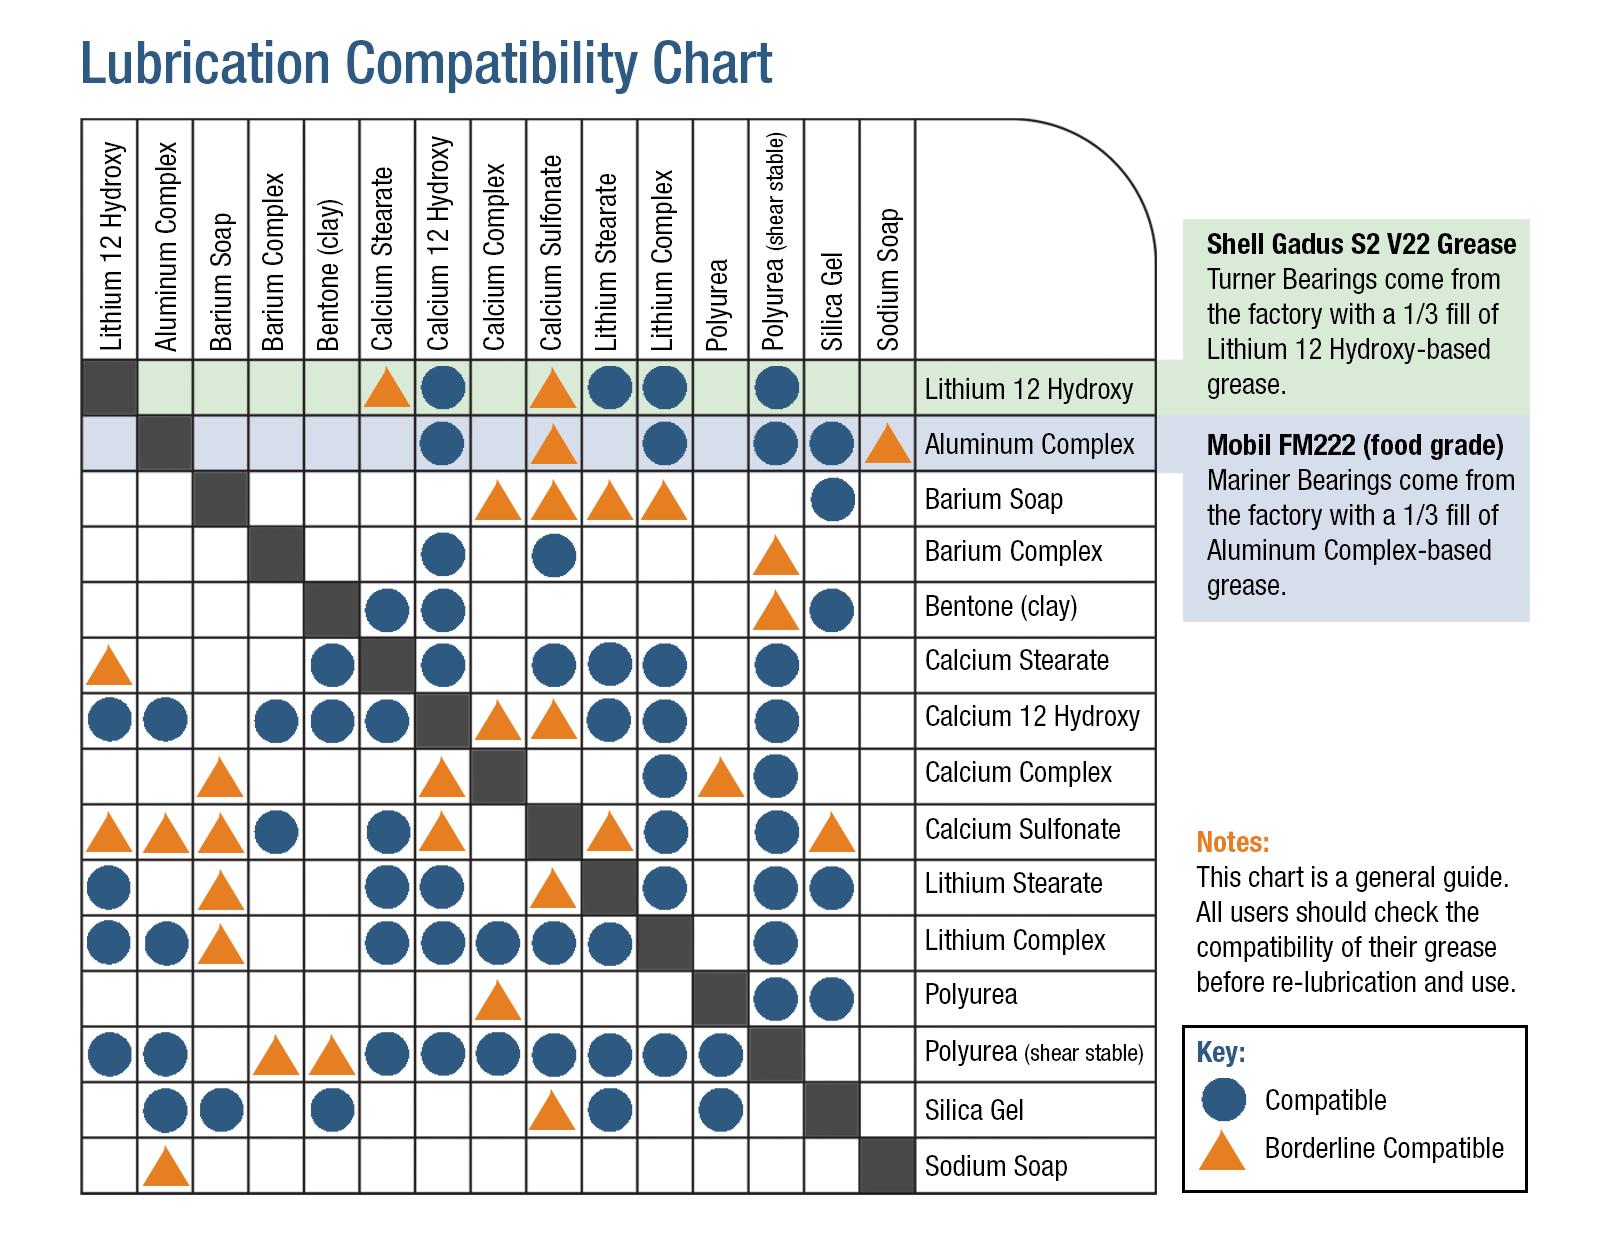 Lubrication Compatibility Chart